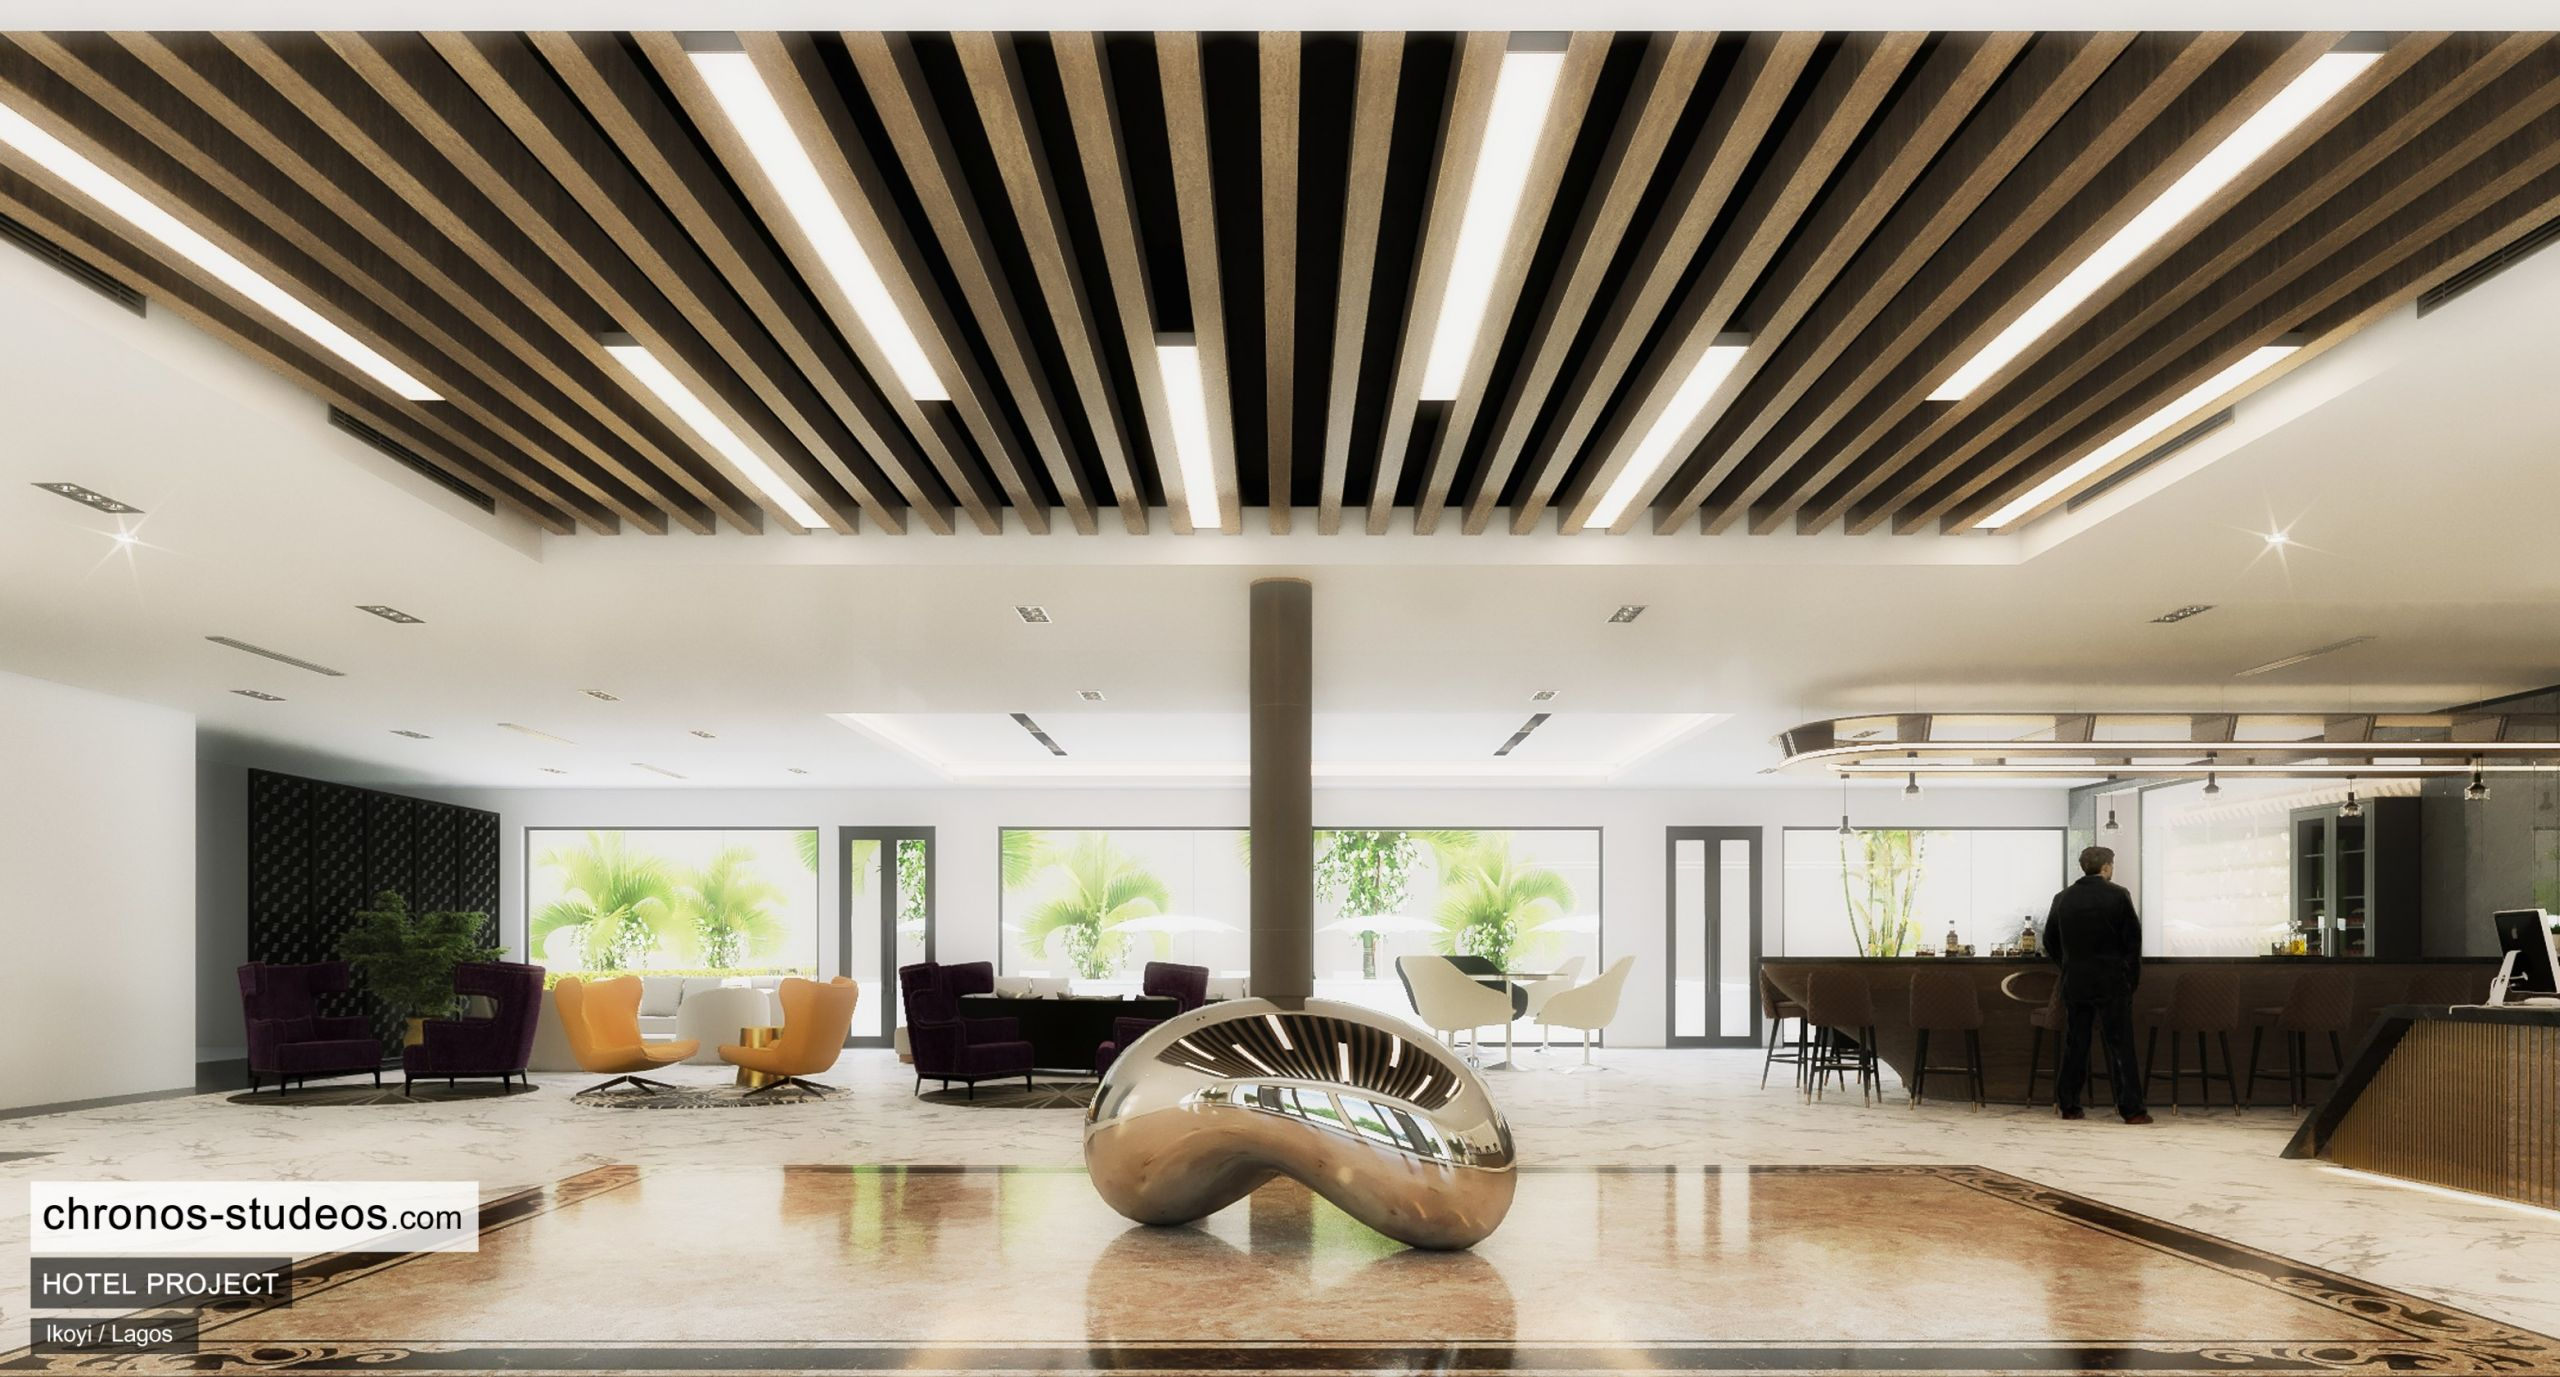 Chronos Studeos Q hotel project